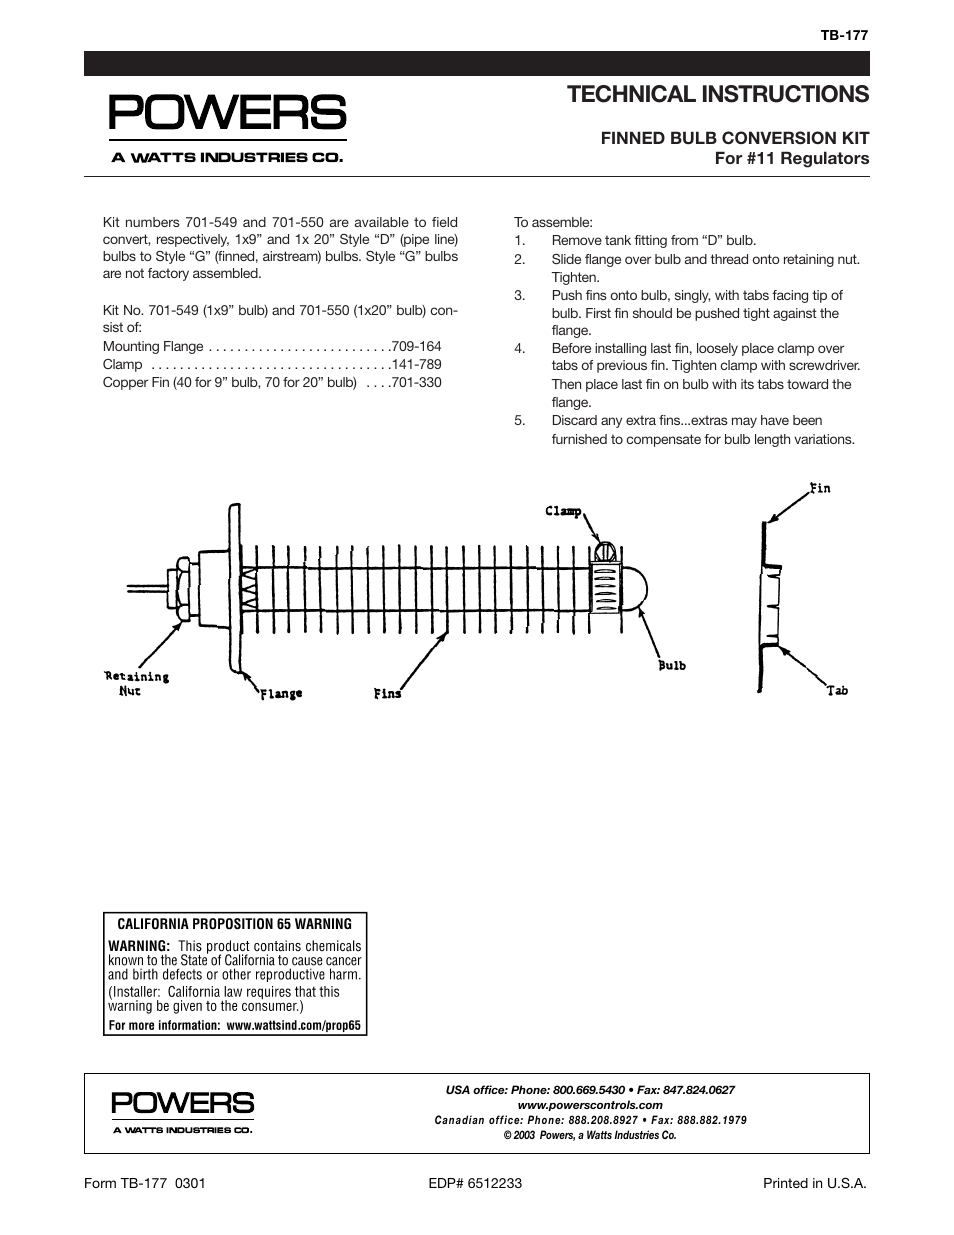 Powers 595 Series 11 Self-Operating Temperature Regulators - Finned